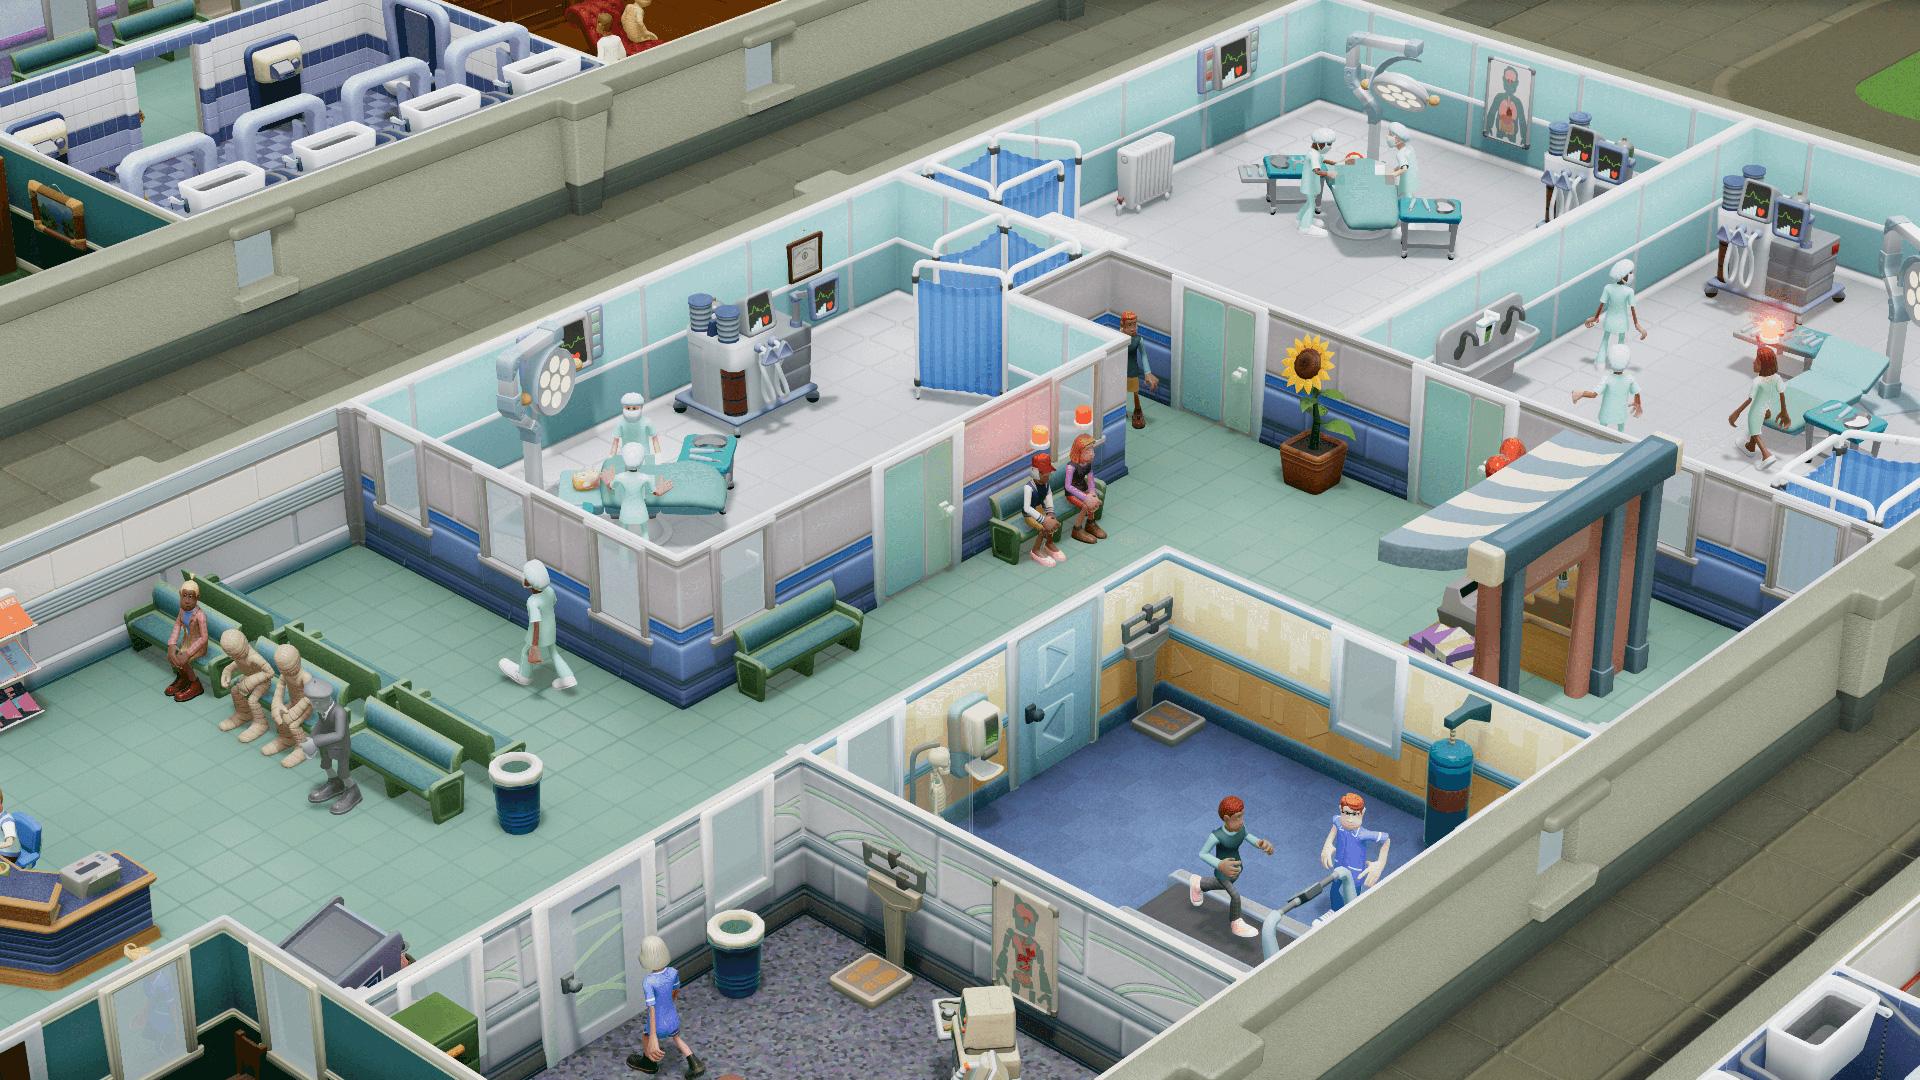 http://www.idgtv.es/archivos/201807/two-point-hospital-img2.jpg